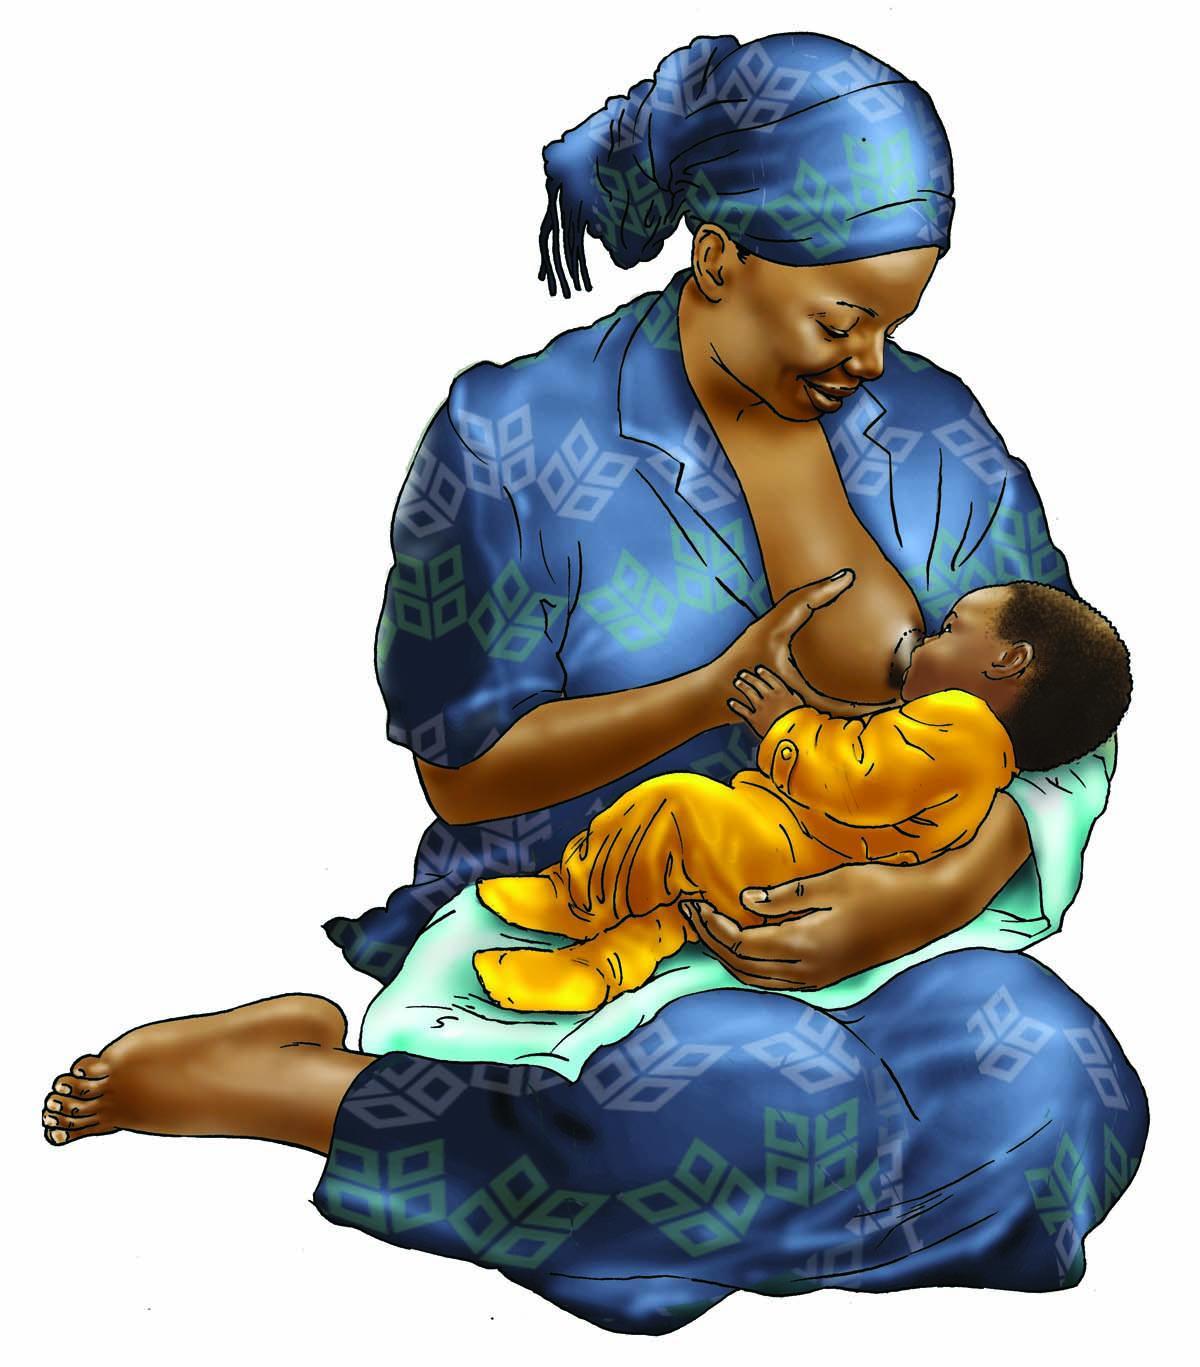 Breastfeeding - Breastfeeding 12-24mo 6-24 mo - 00A - Non-country specific